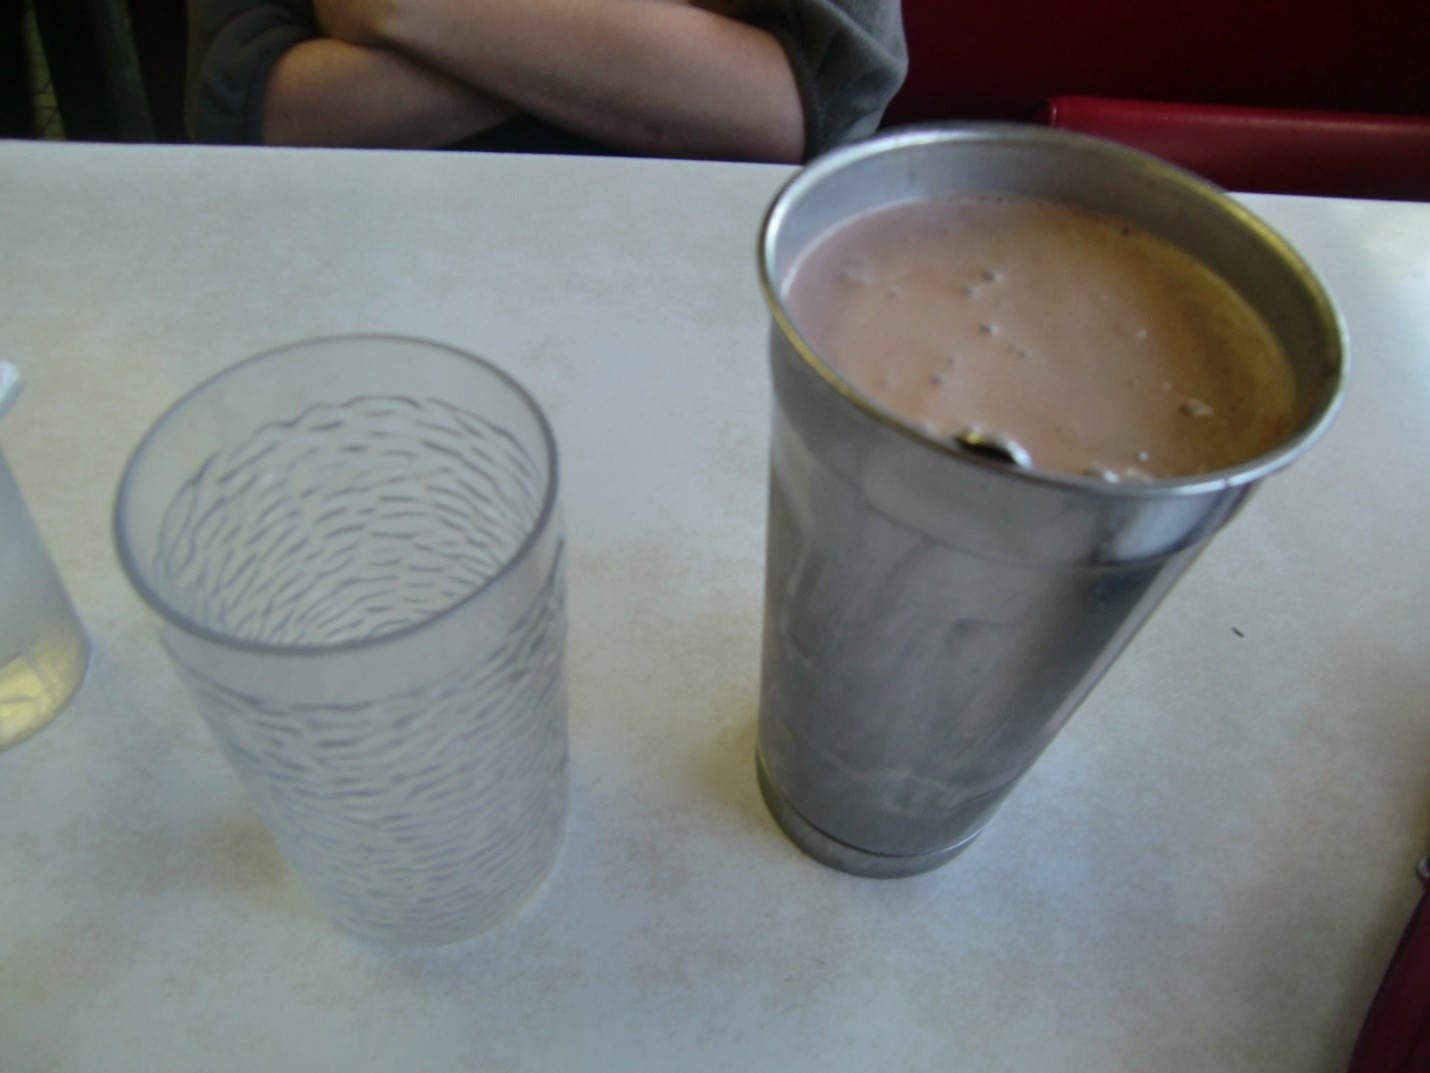 Bikin Milkshake Tanpa Memakai Blender? Bisa Milk Lovers!